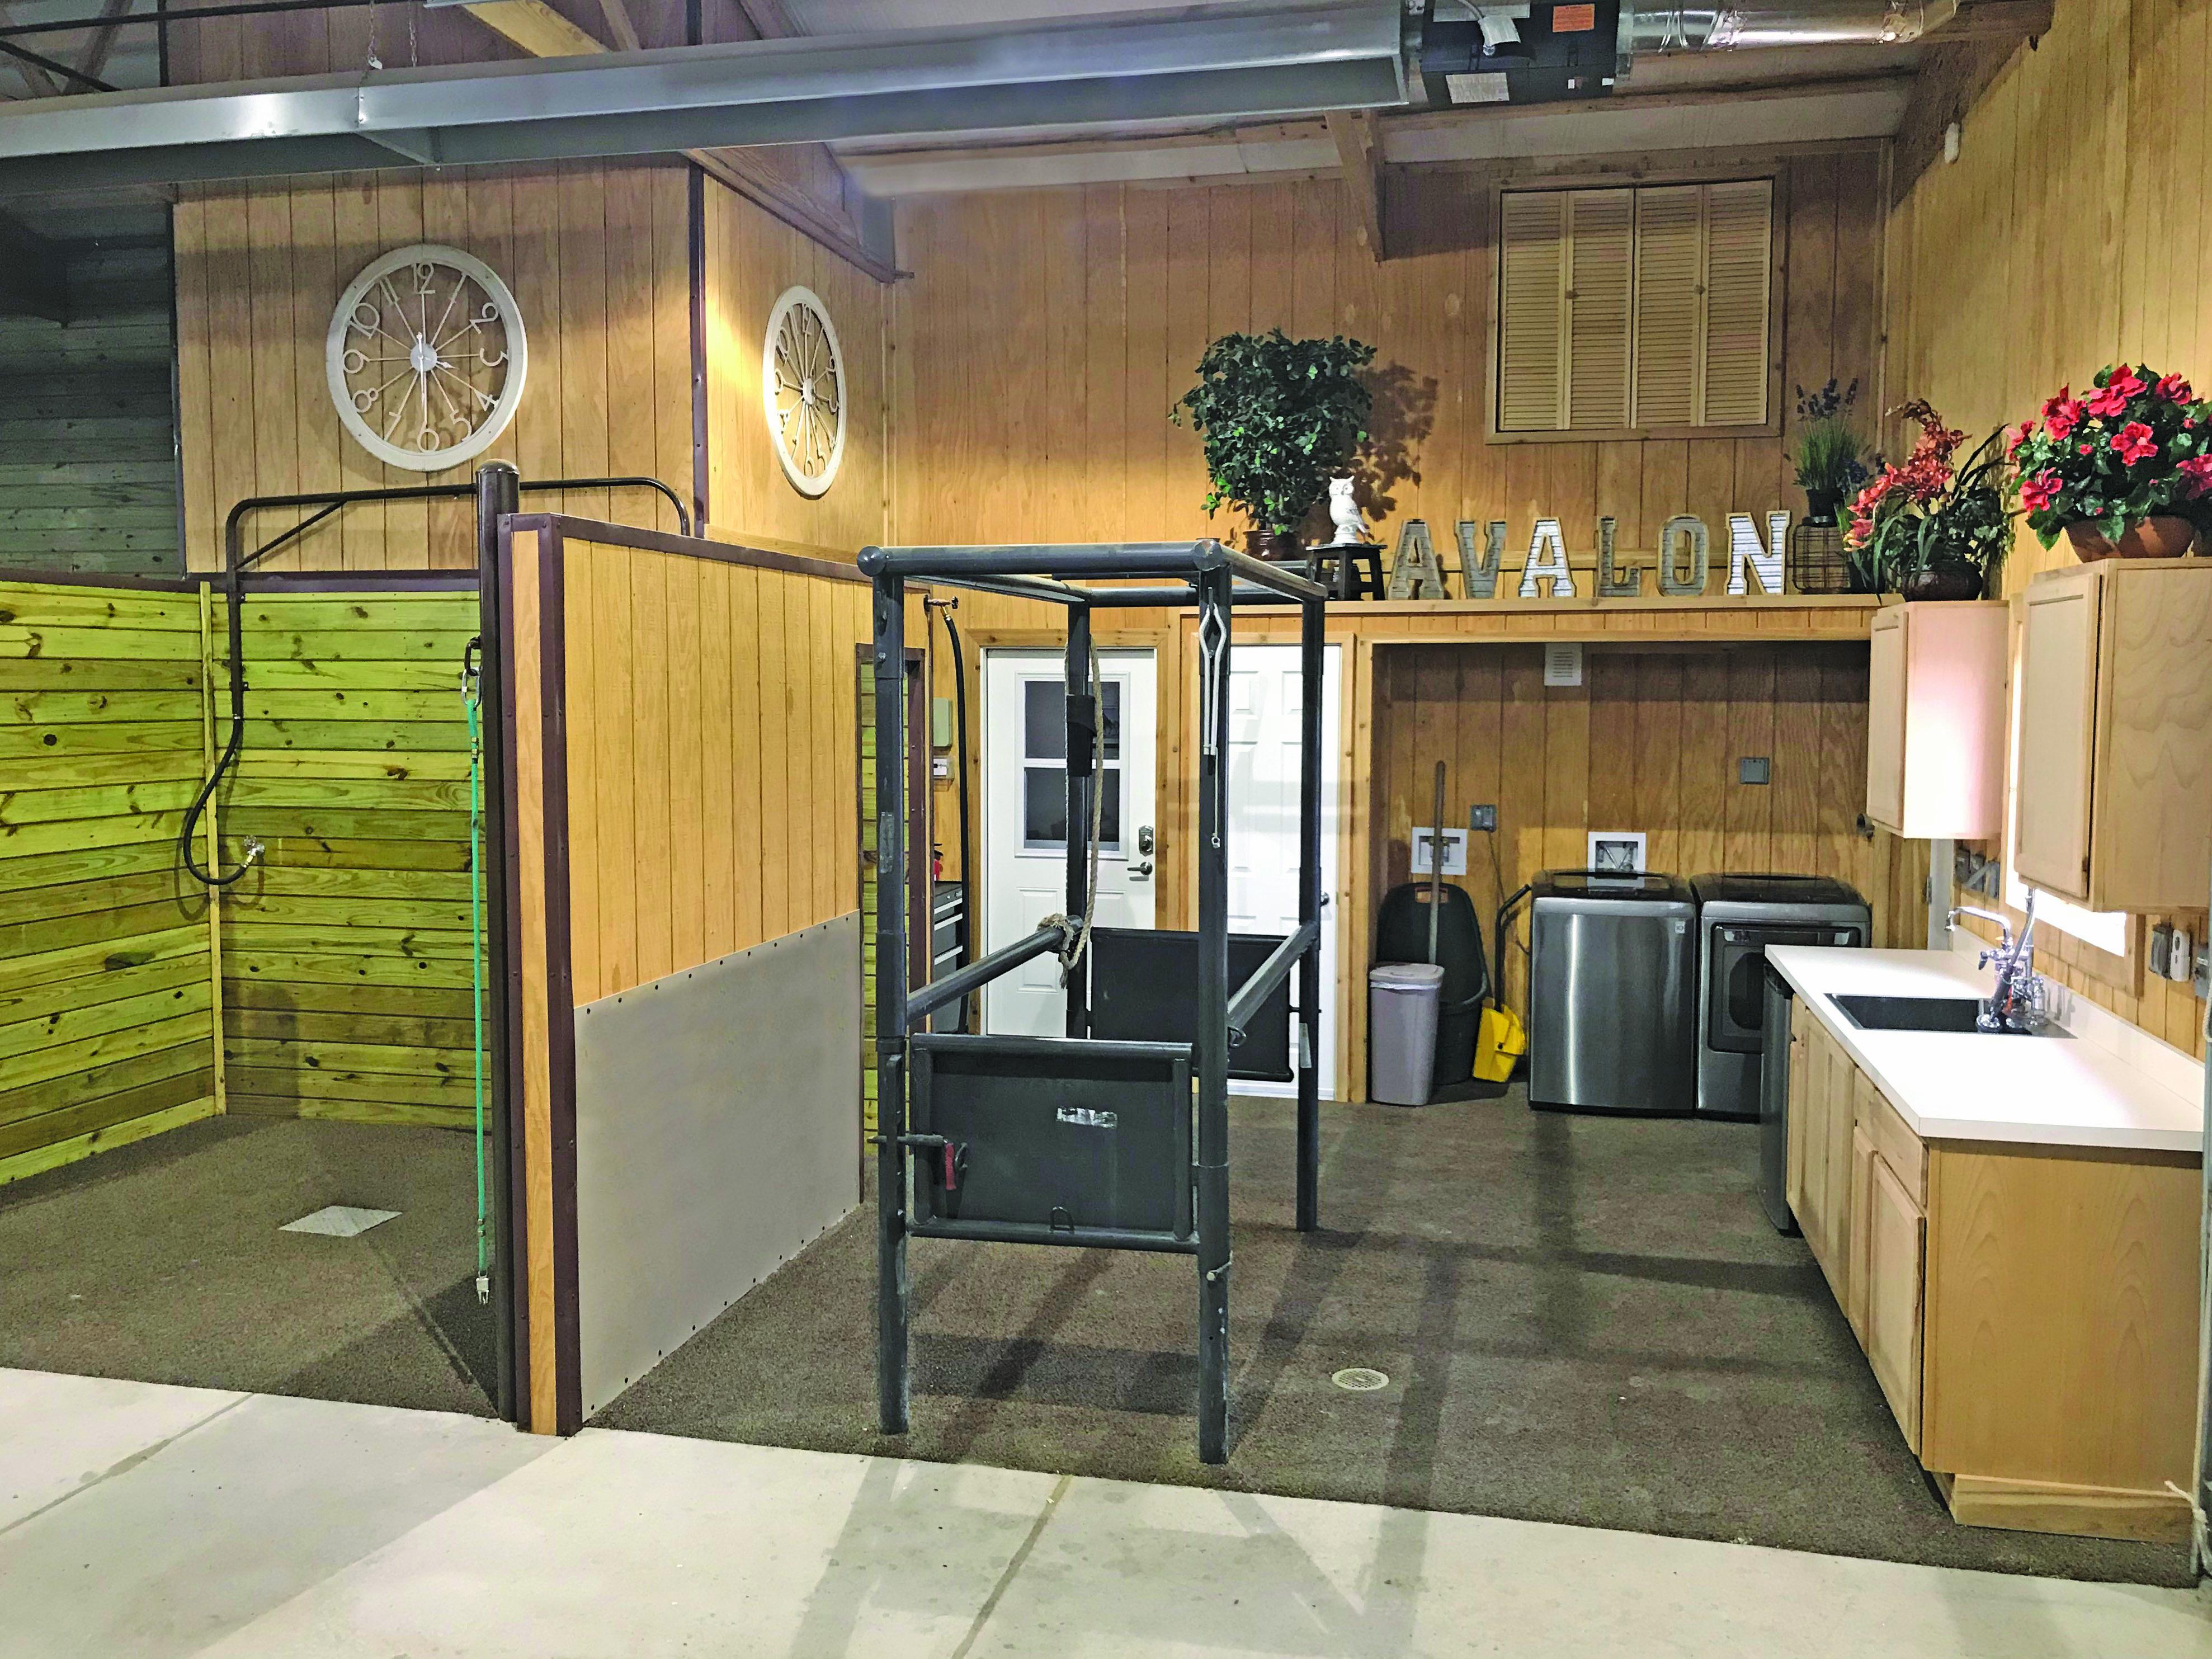 Berthoud S Newest Horse Breeding Facility To Host Open House Nov 17 Berthoud Weekly Surveyorberthoud Weekly Surveyor